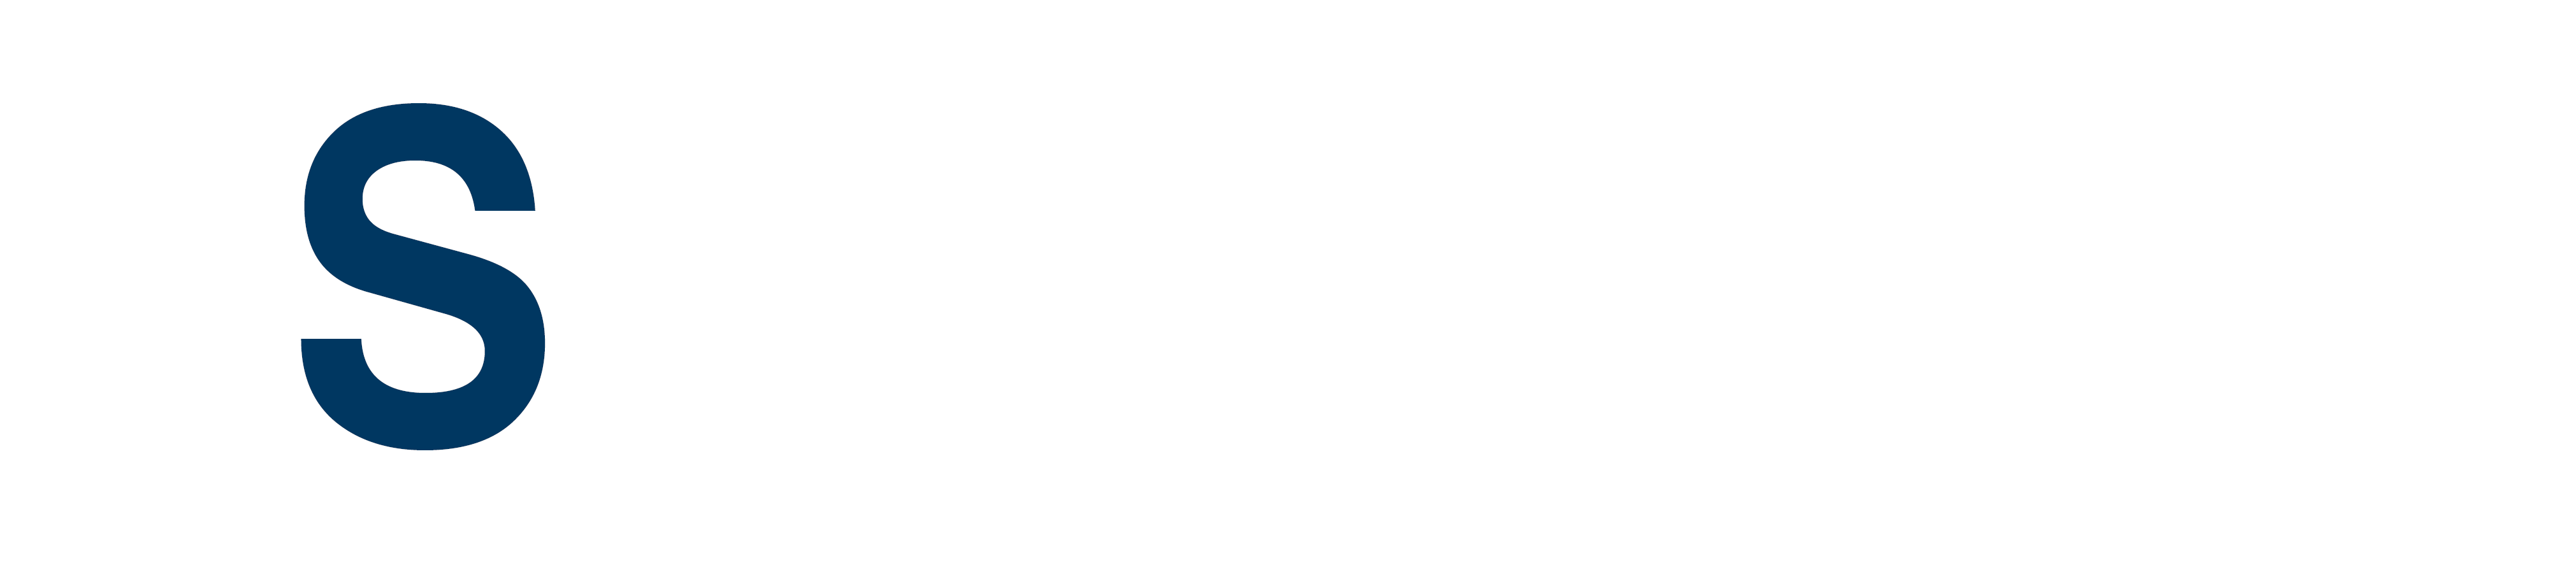 Springform Logo Digital Out Of Home - Online Visual Merchandising Fingerfood und Snacks